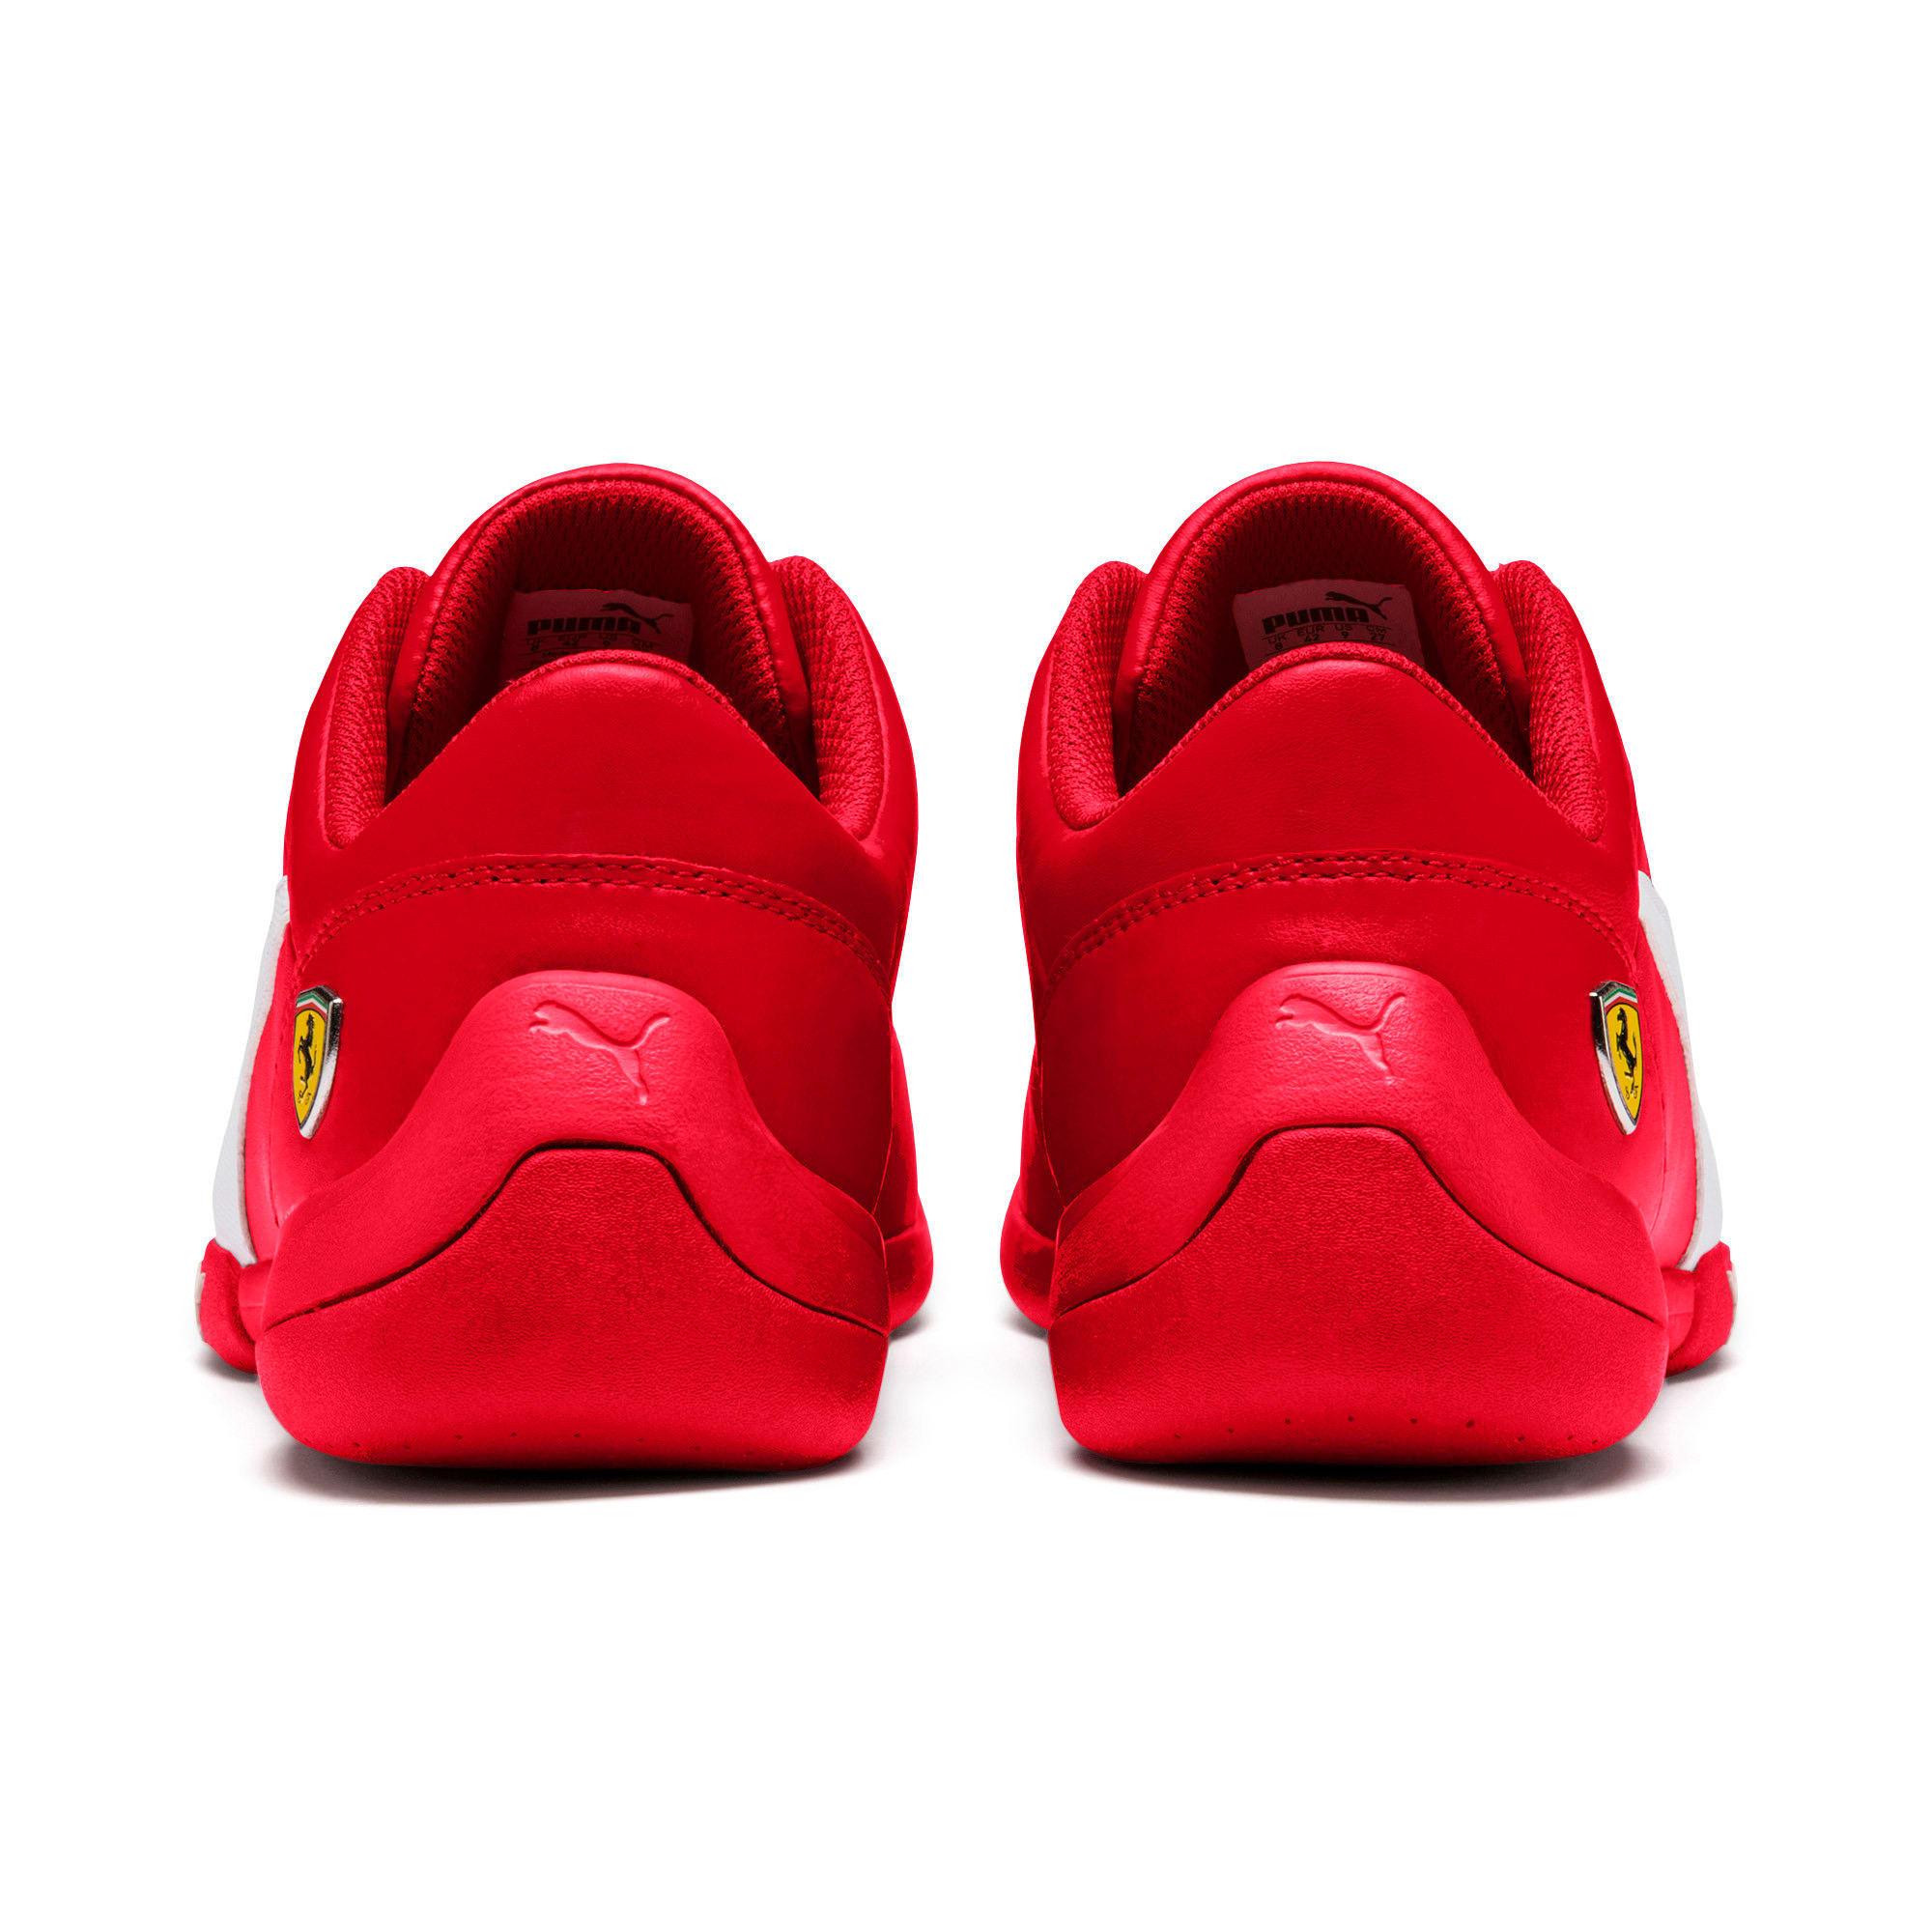 Thumbnail 4 of Scuderia Ferrari Kart Cat III Shoes, Rosso Corsa-White, medium